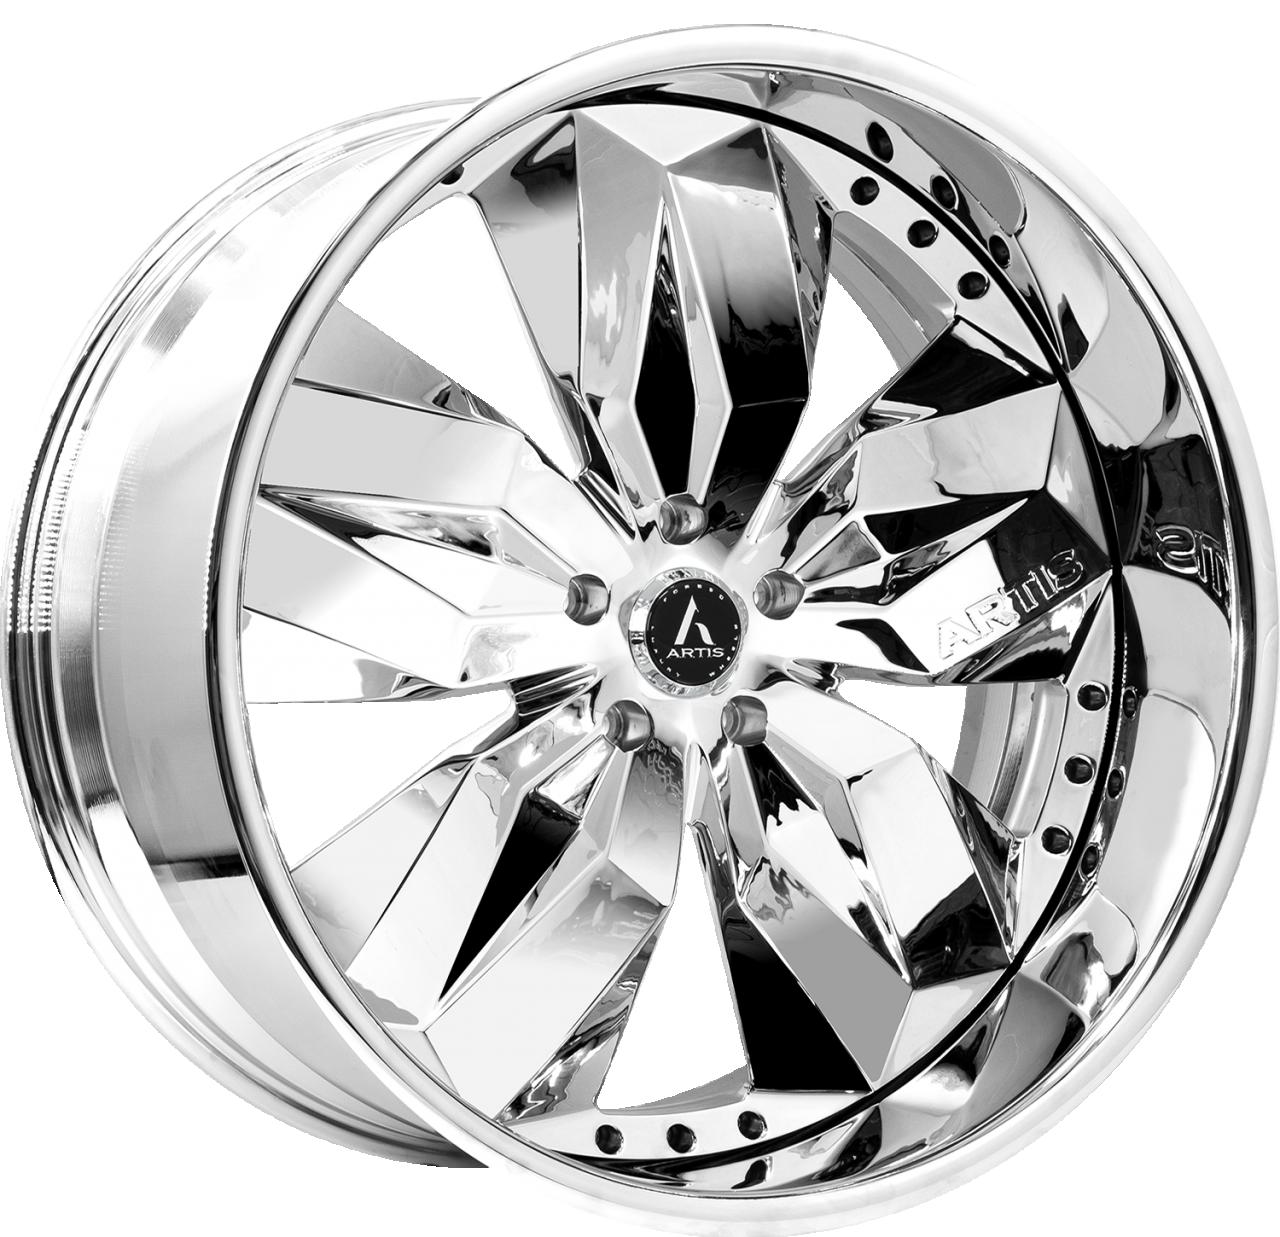 Artis Forged Krystal wheel with Chrome finish